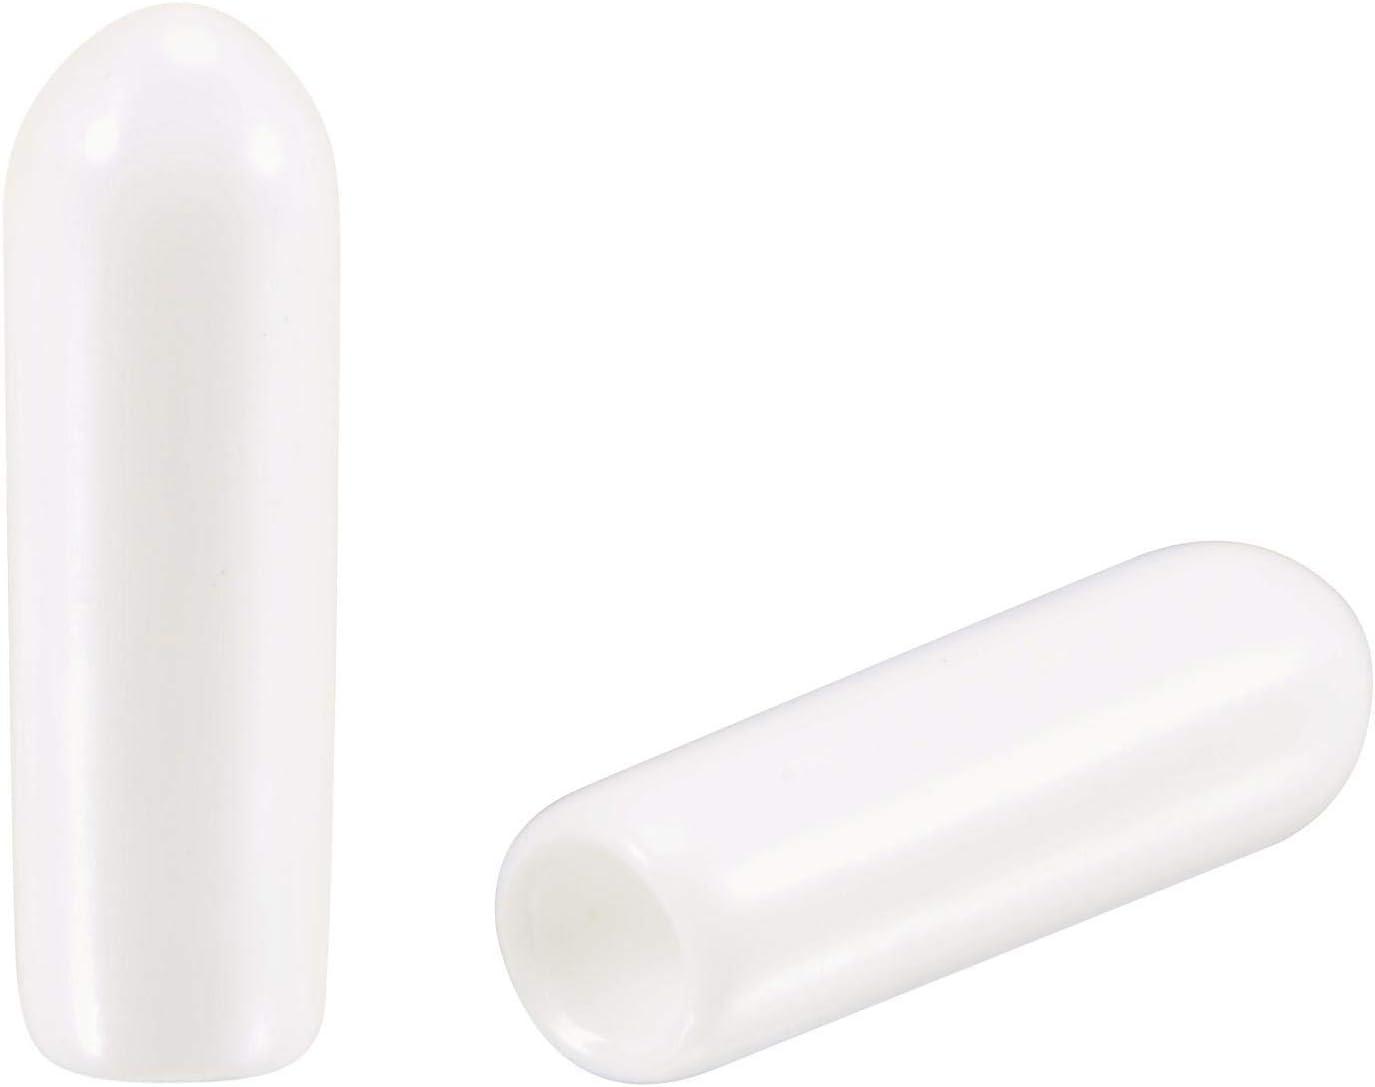 uxcell 50pcs Round Rubber End Caps 1/8